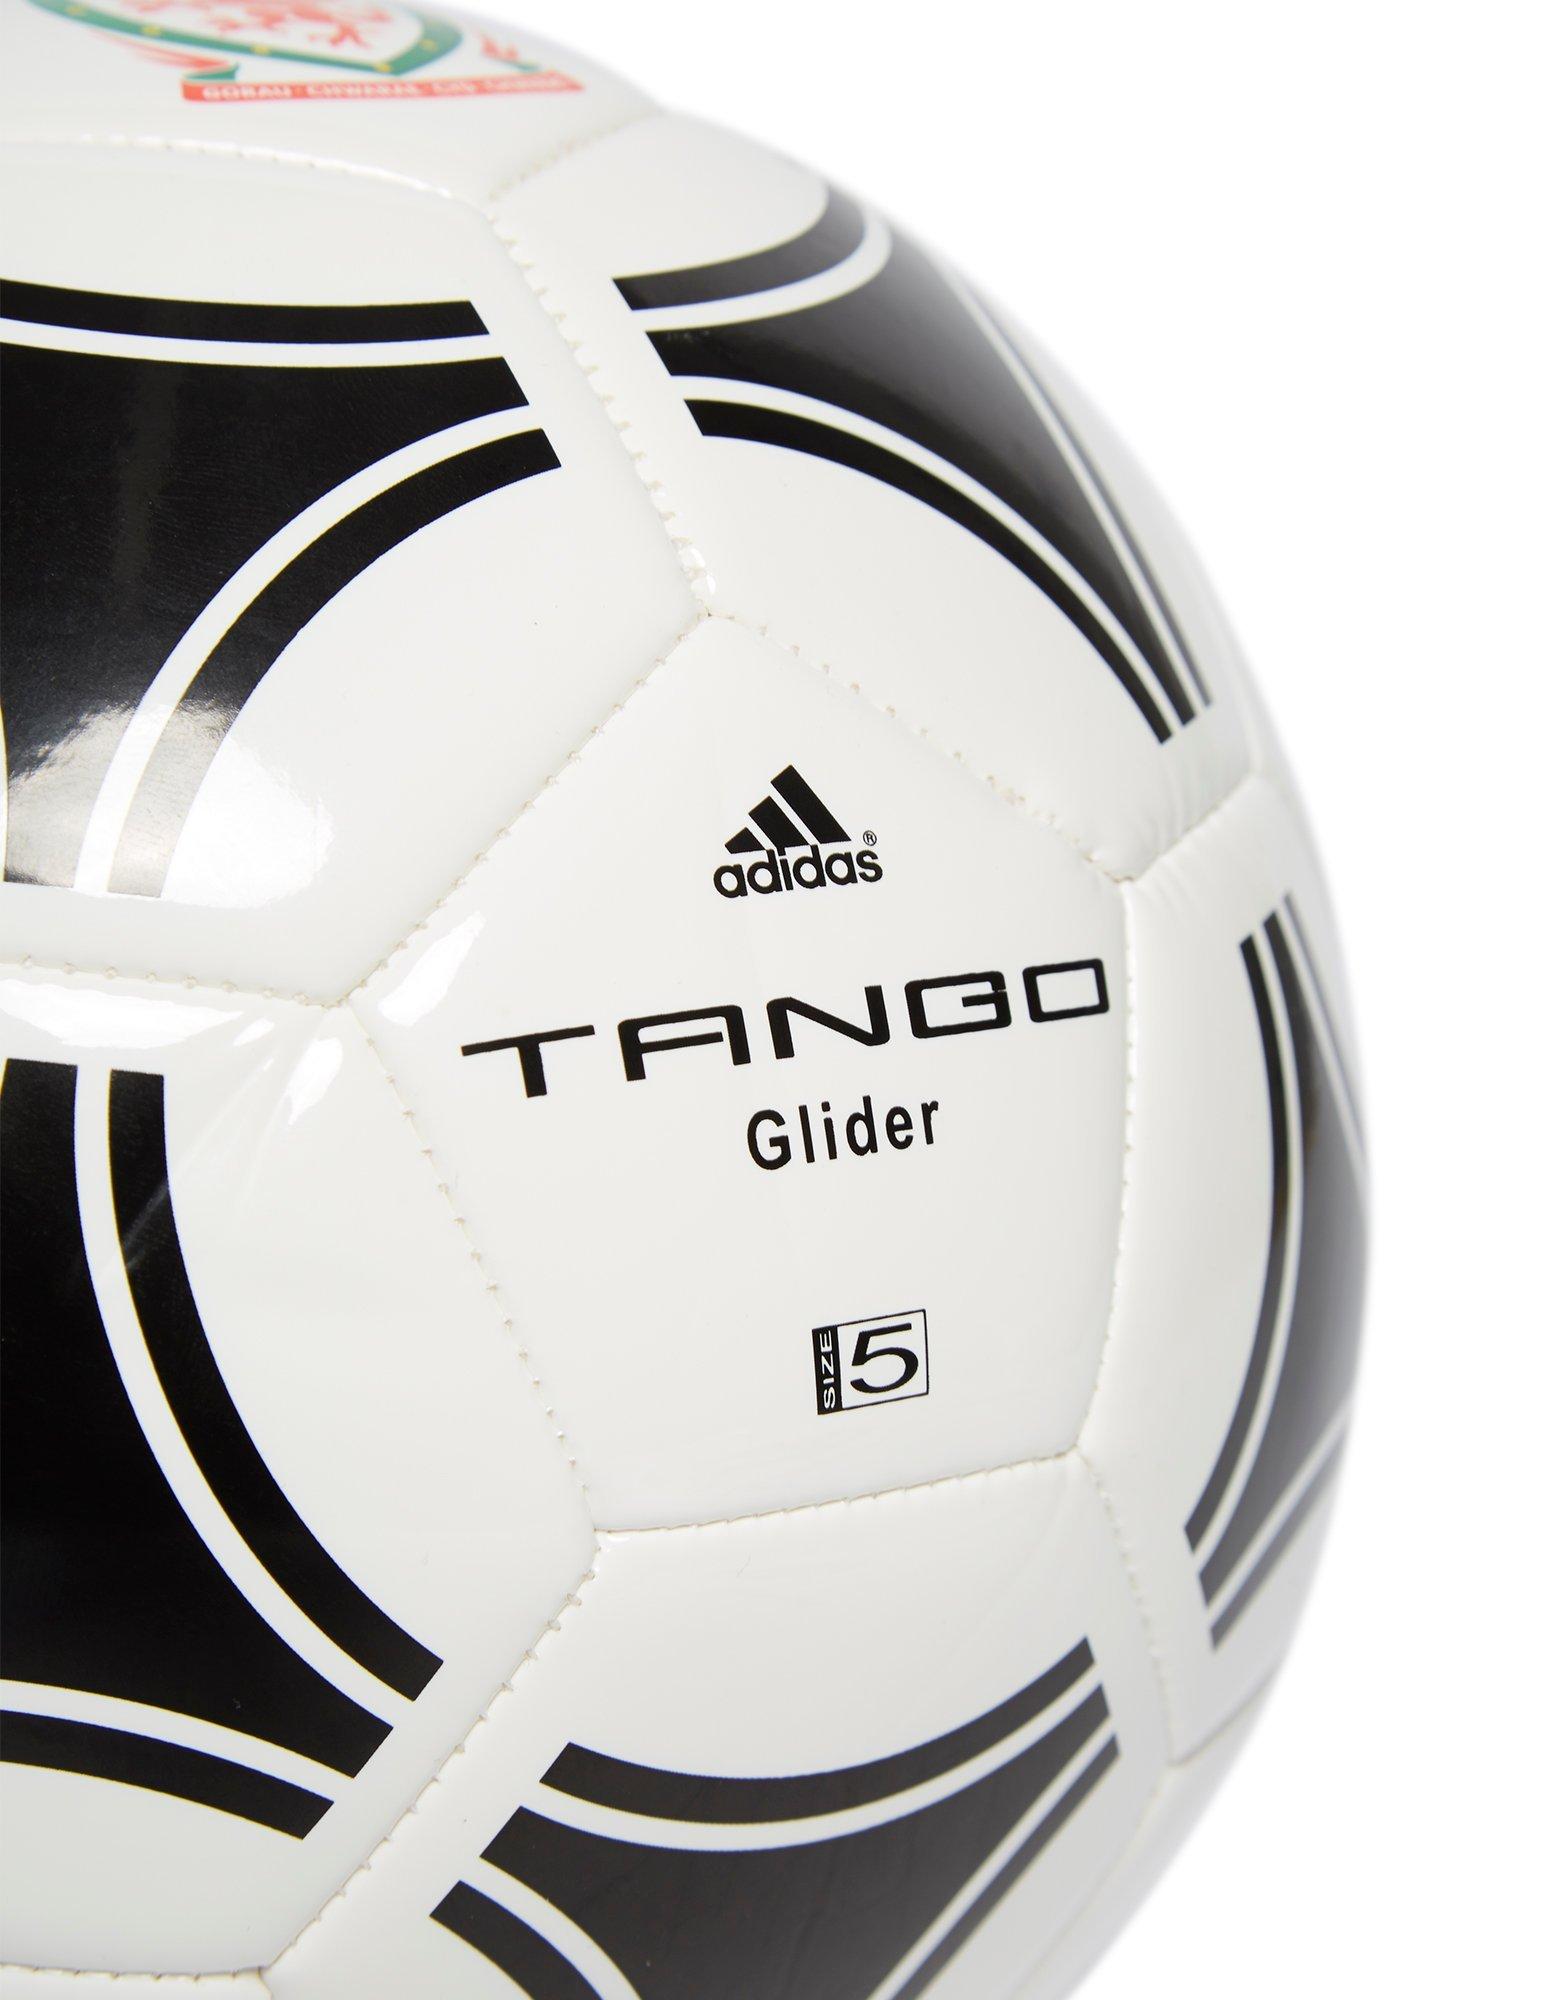 adidas FA Wales Tango Glider Football